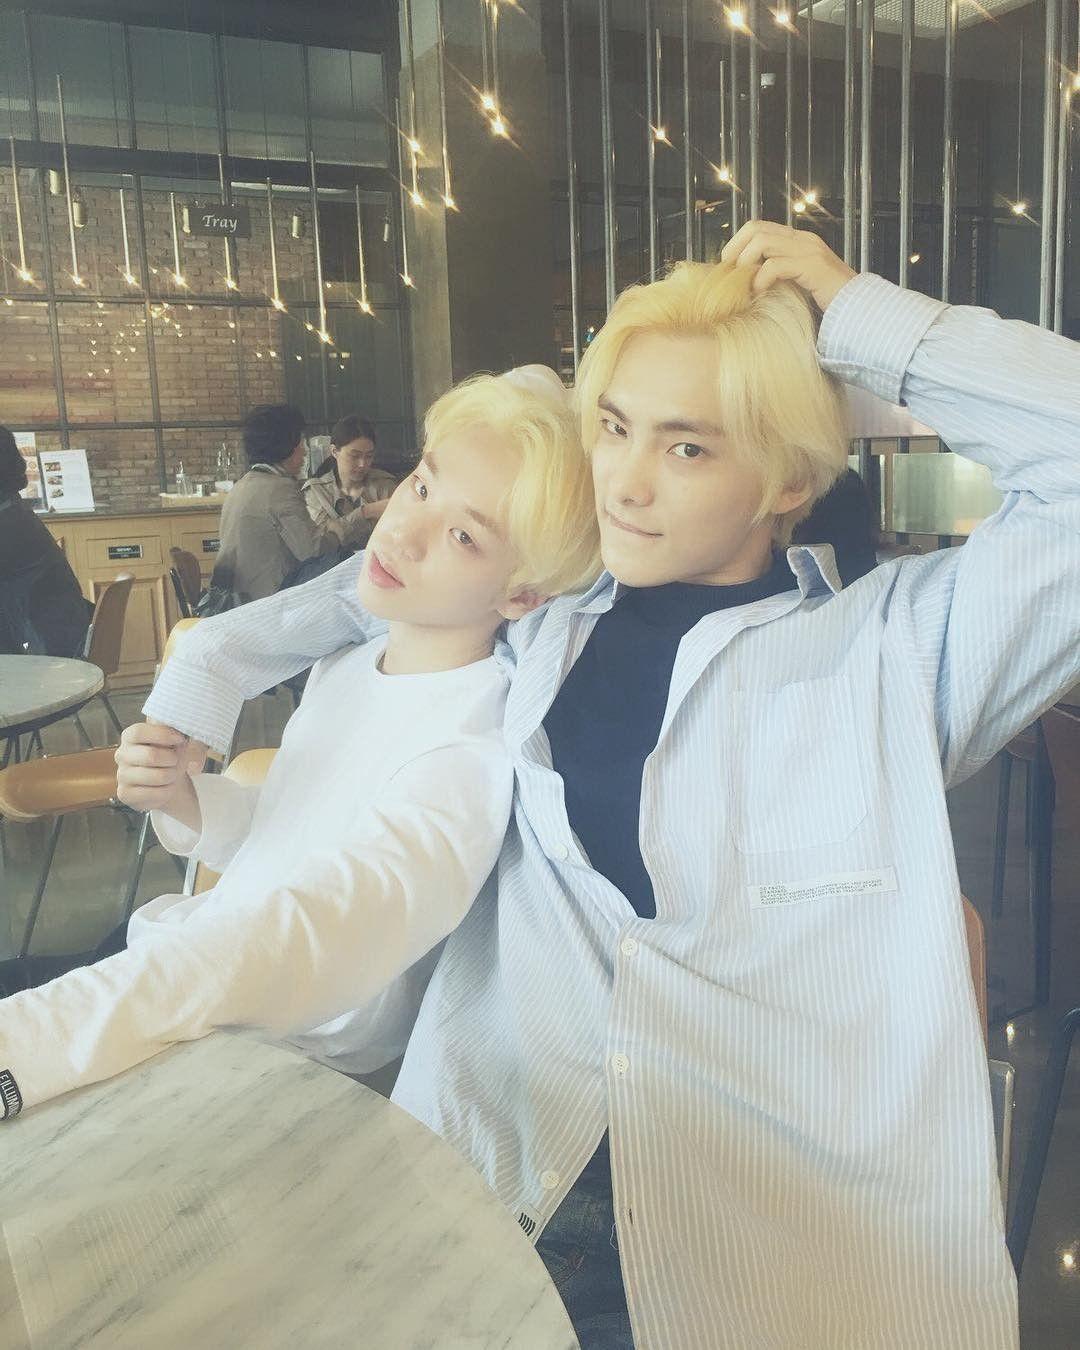 2017 4 11 Ace Boy Groups Kpop